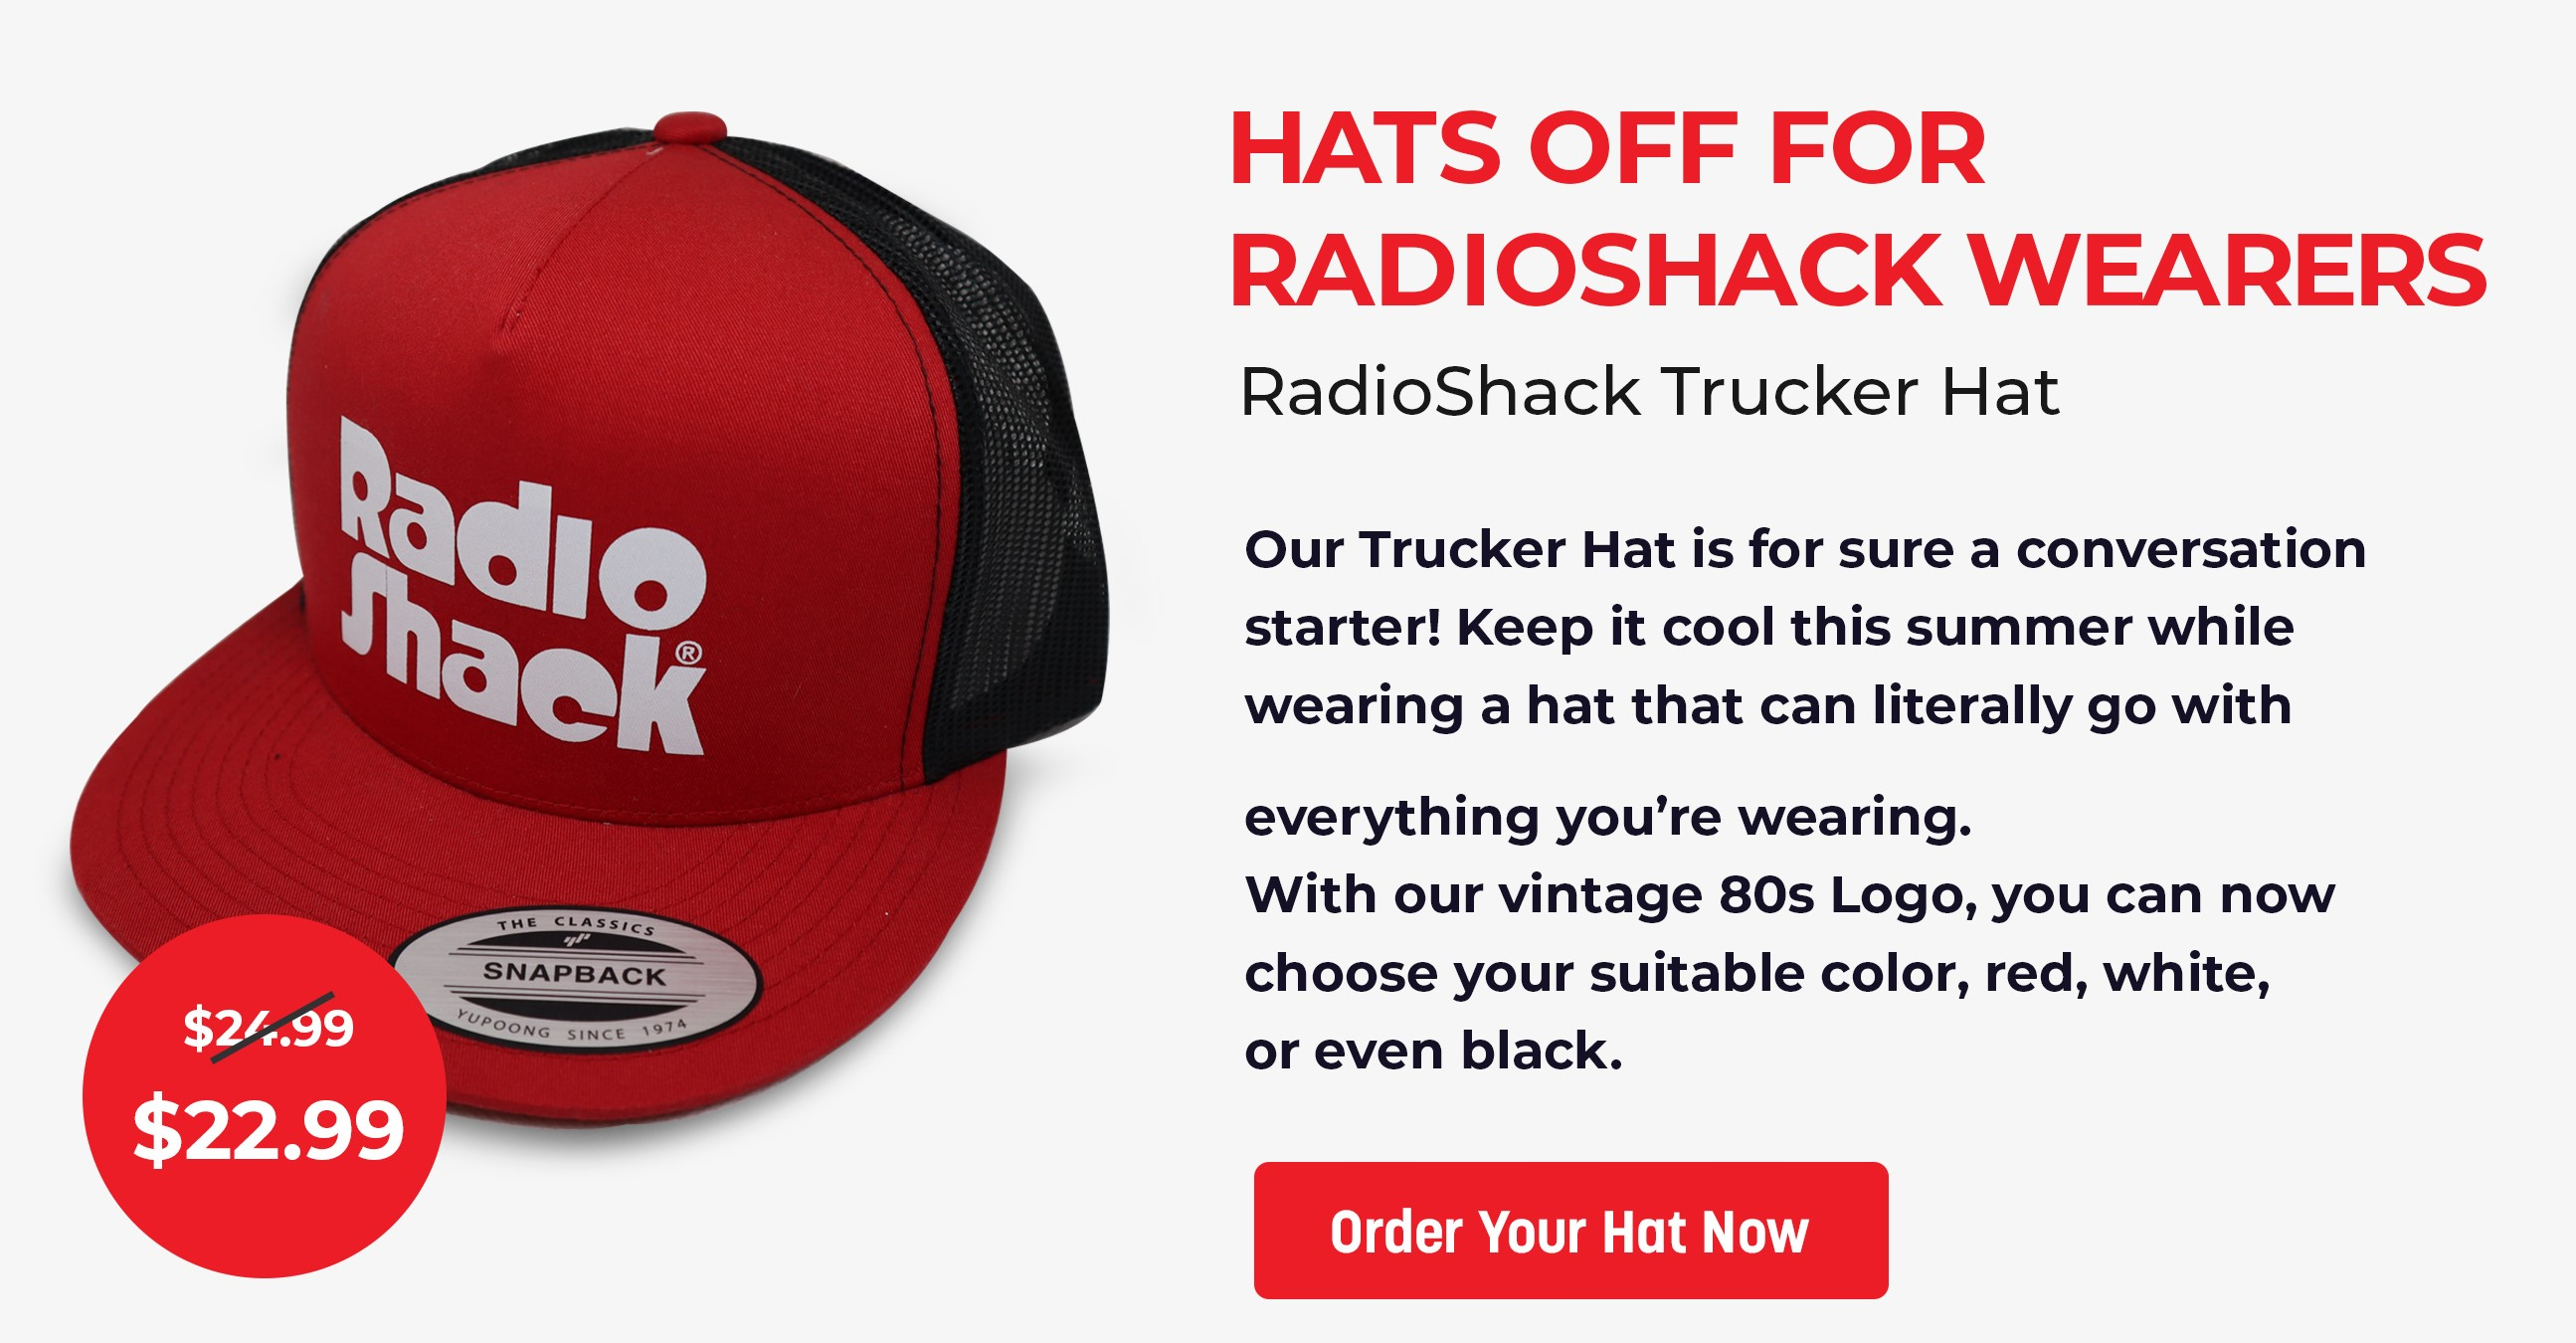 Hats off for RadioShack wearers